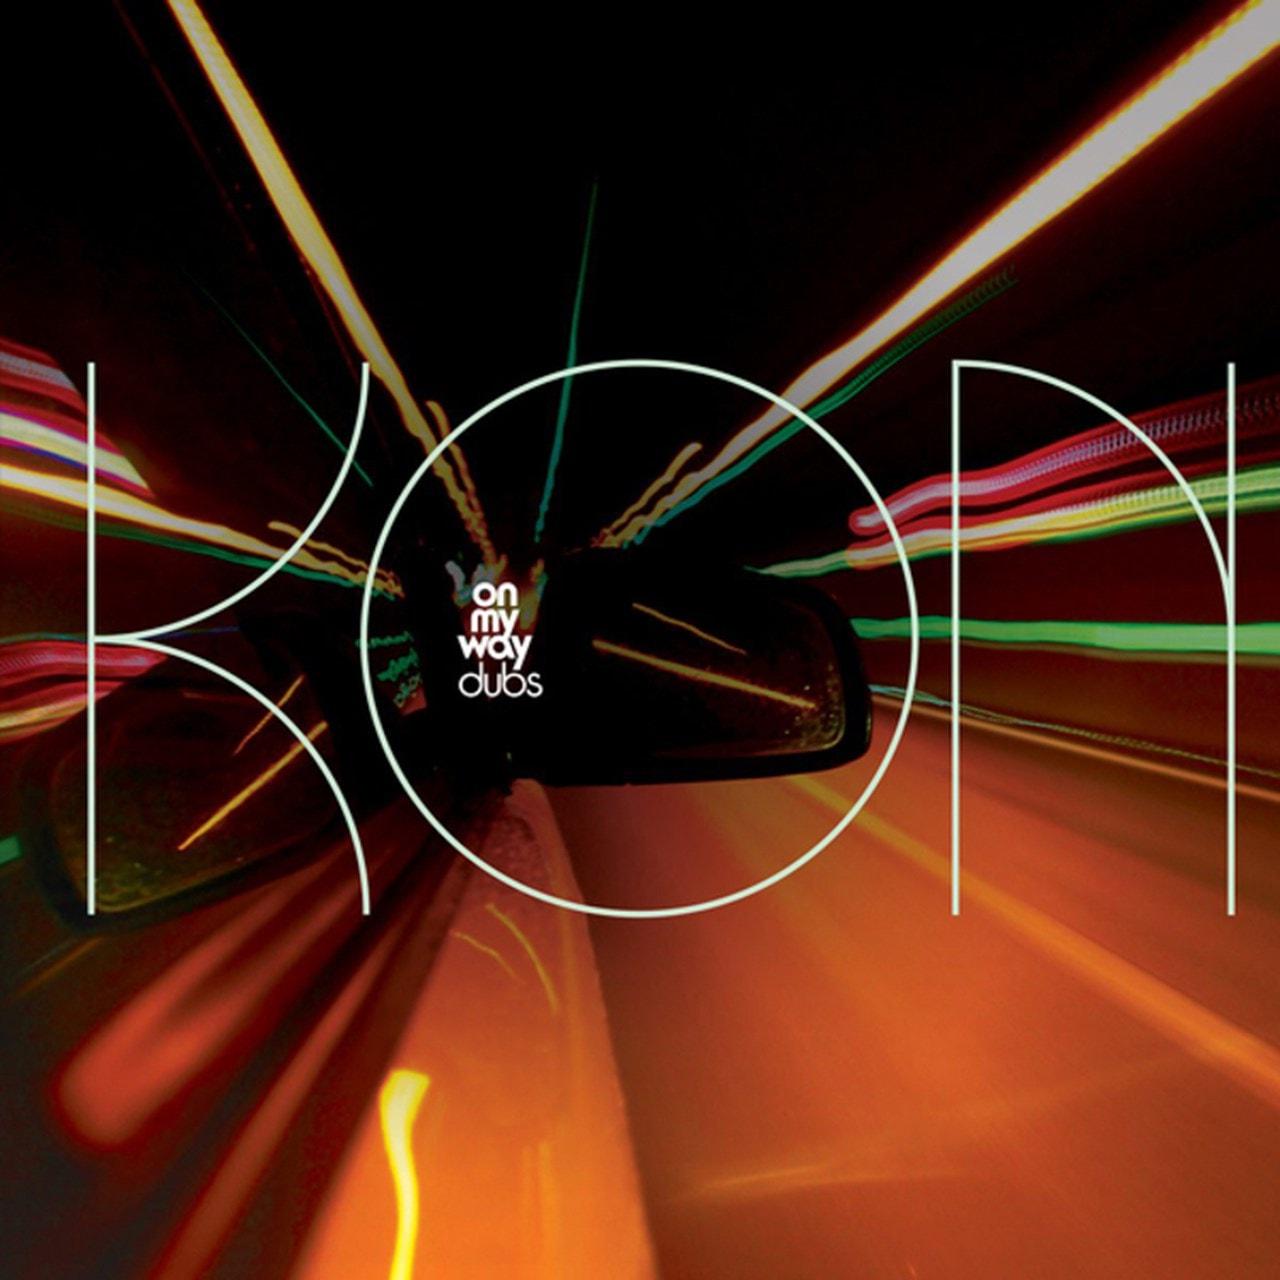 On My Way Dubs - 1